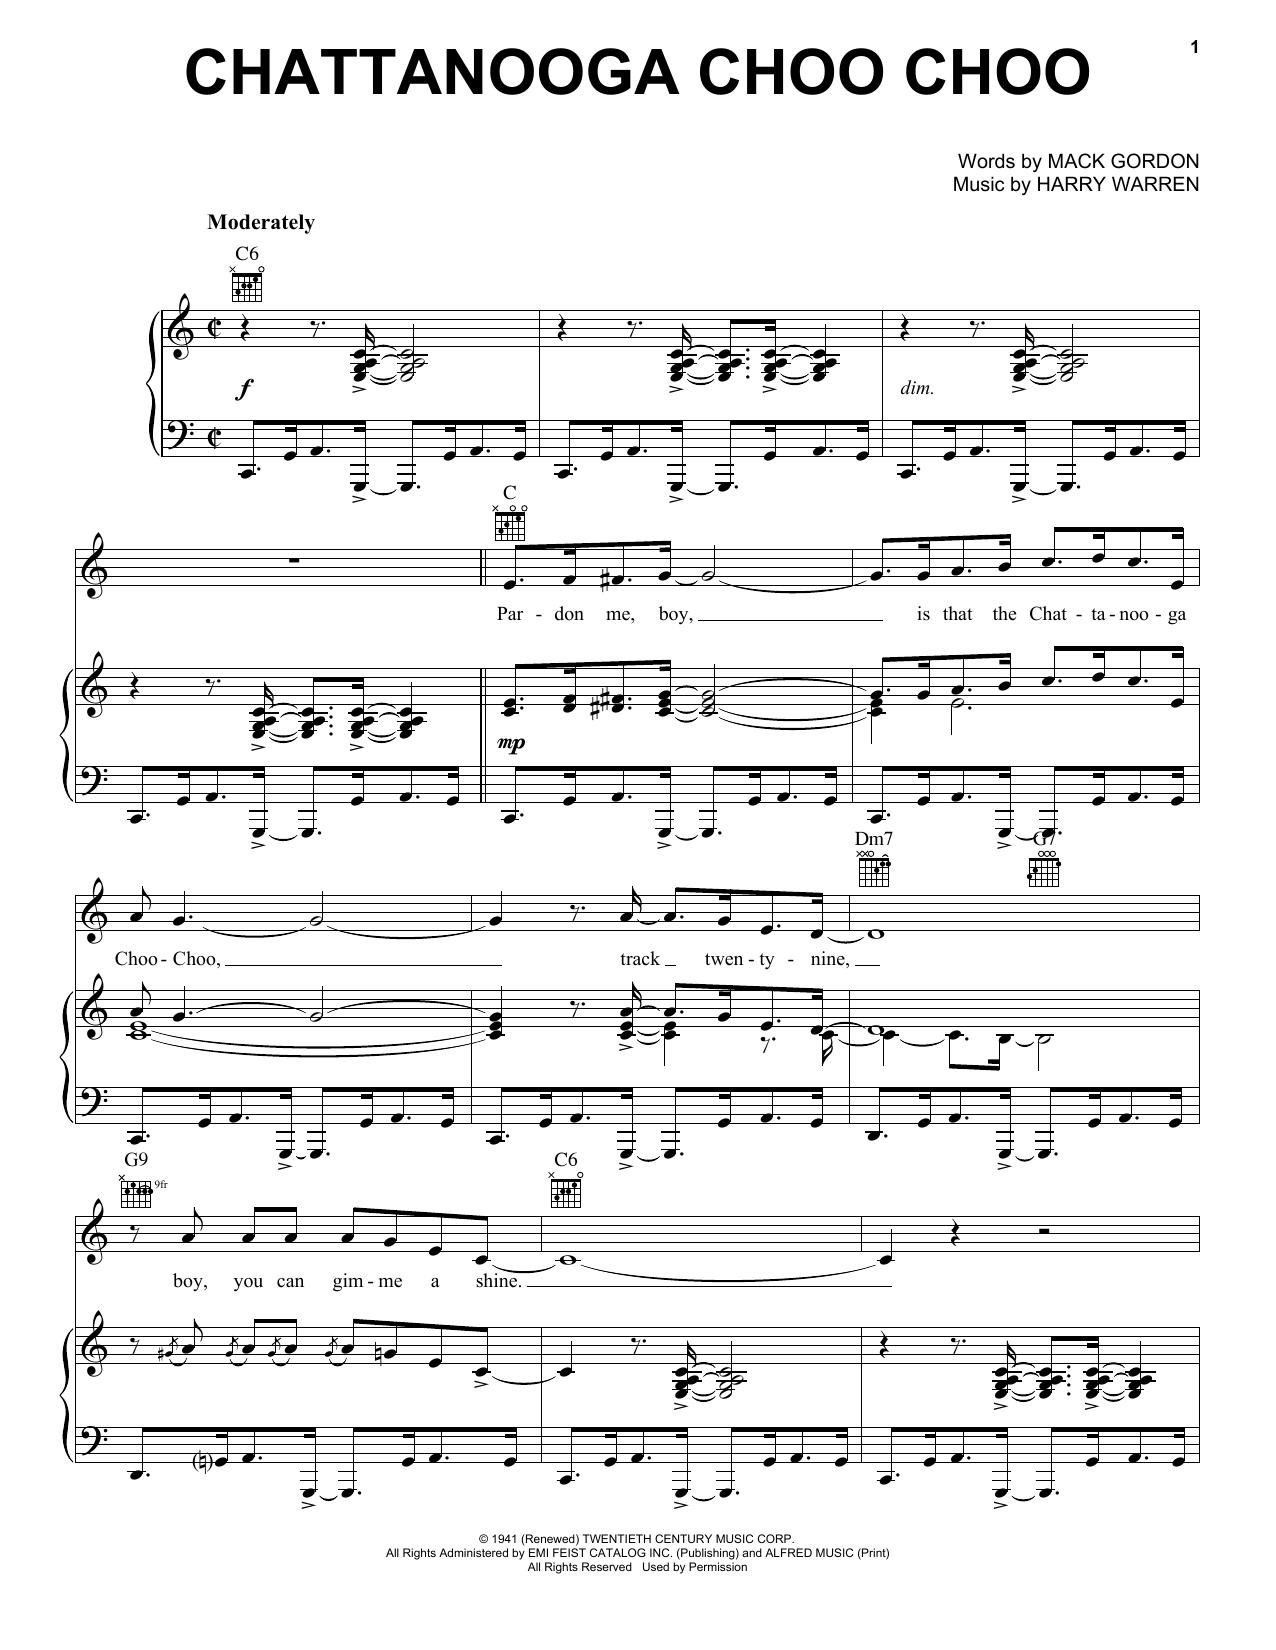 Glenn Miller Chattanooga Choo Choo sheet music notes and chords. Download Printable PDF.